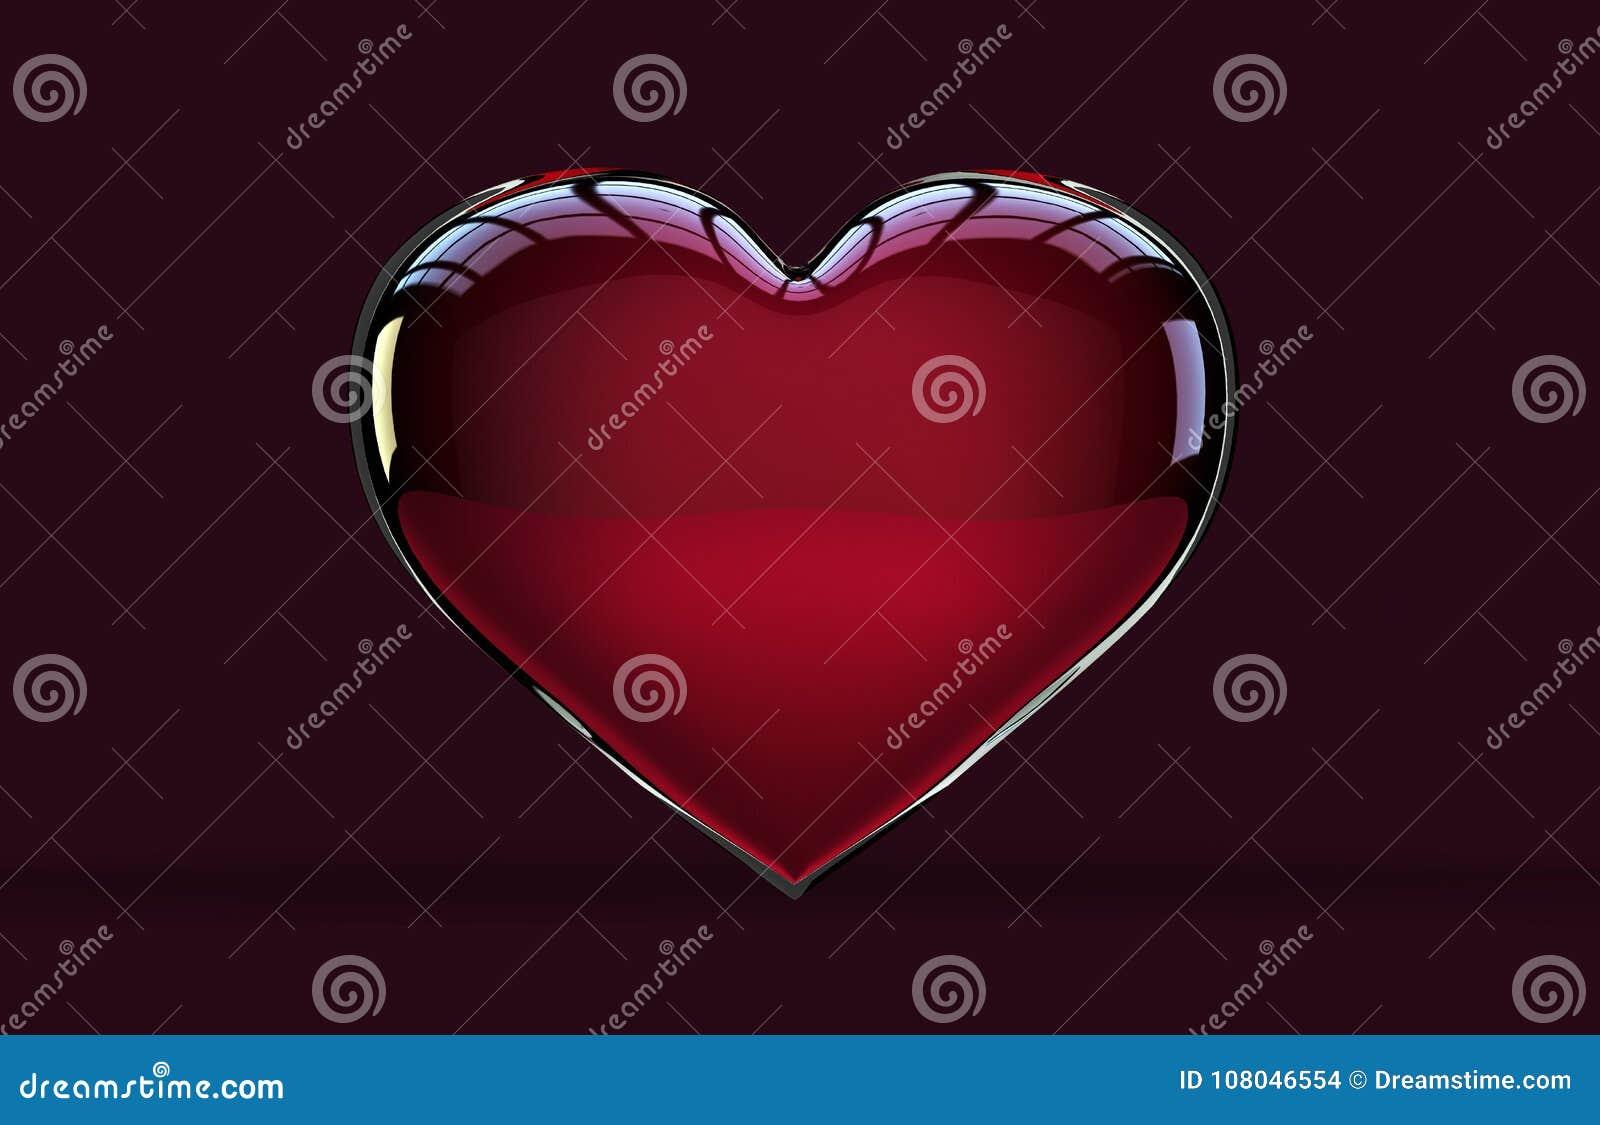 Isolated shining heart shape icon